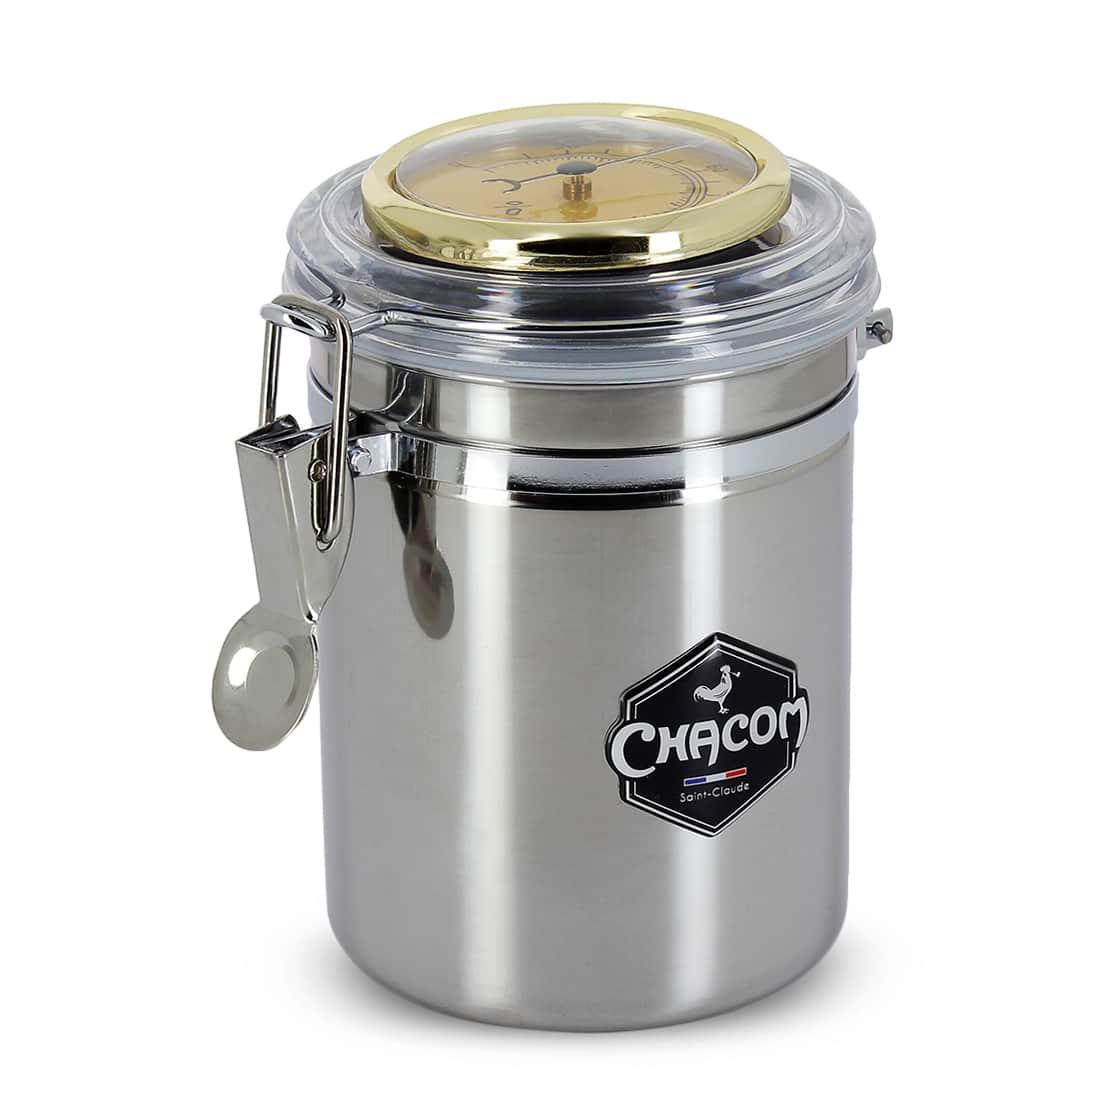 Photo #3 de Pot à tabac Chacom Inox Grand Modèle